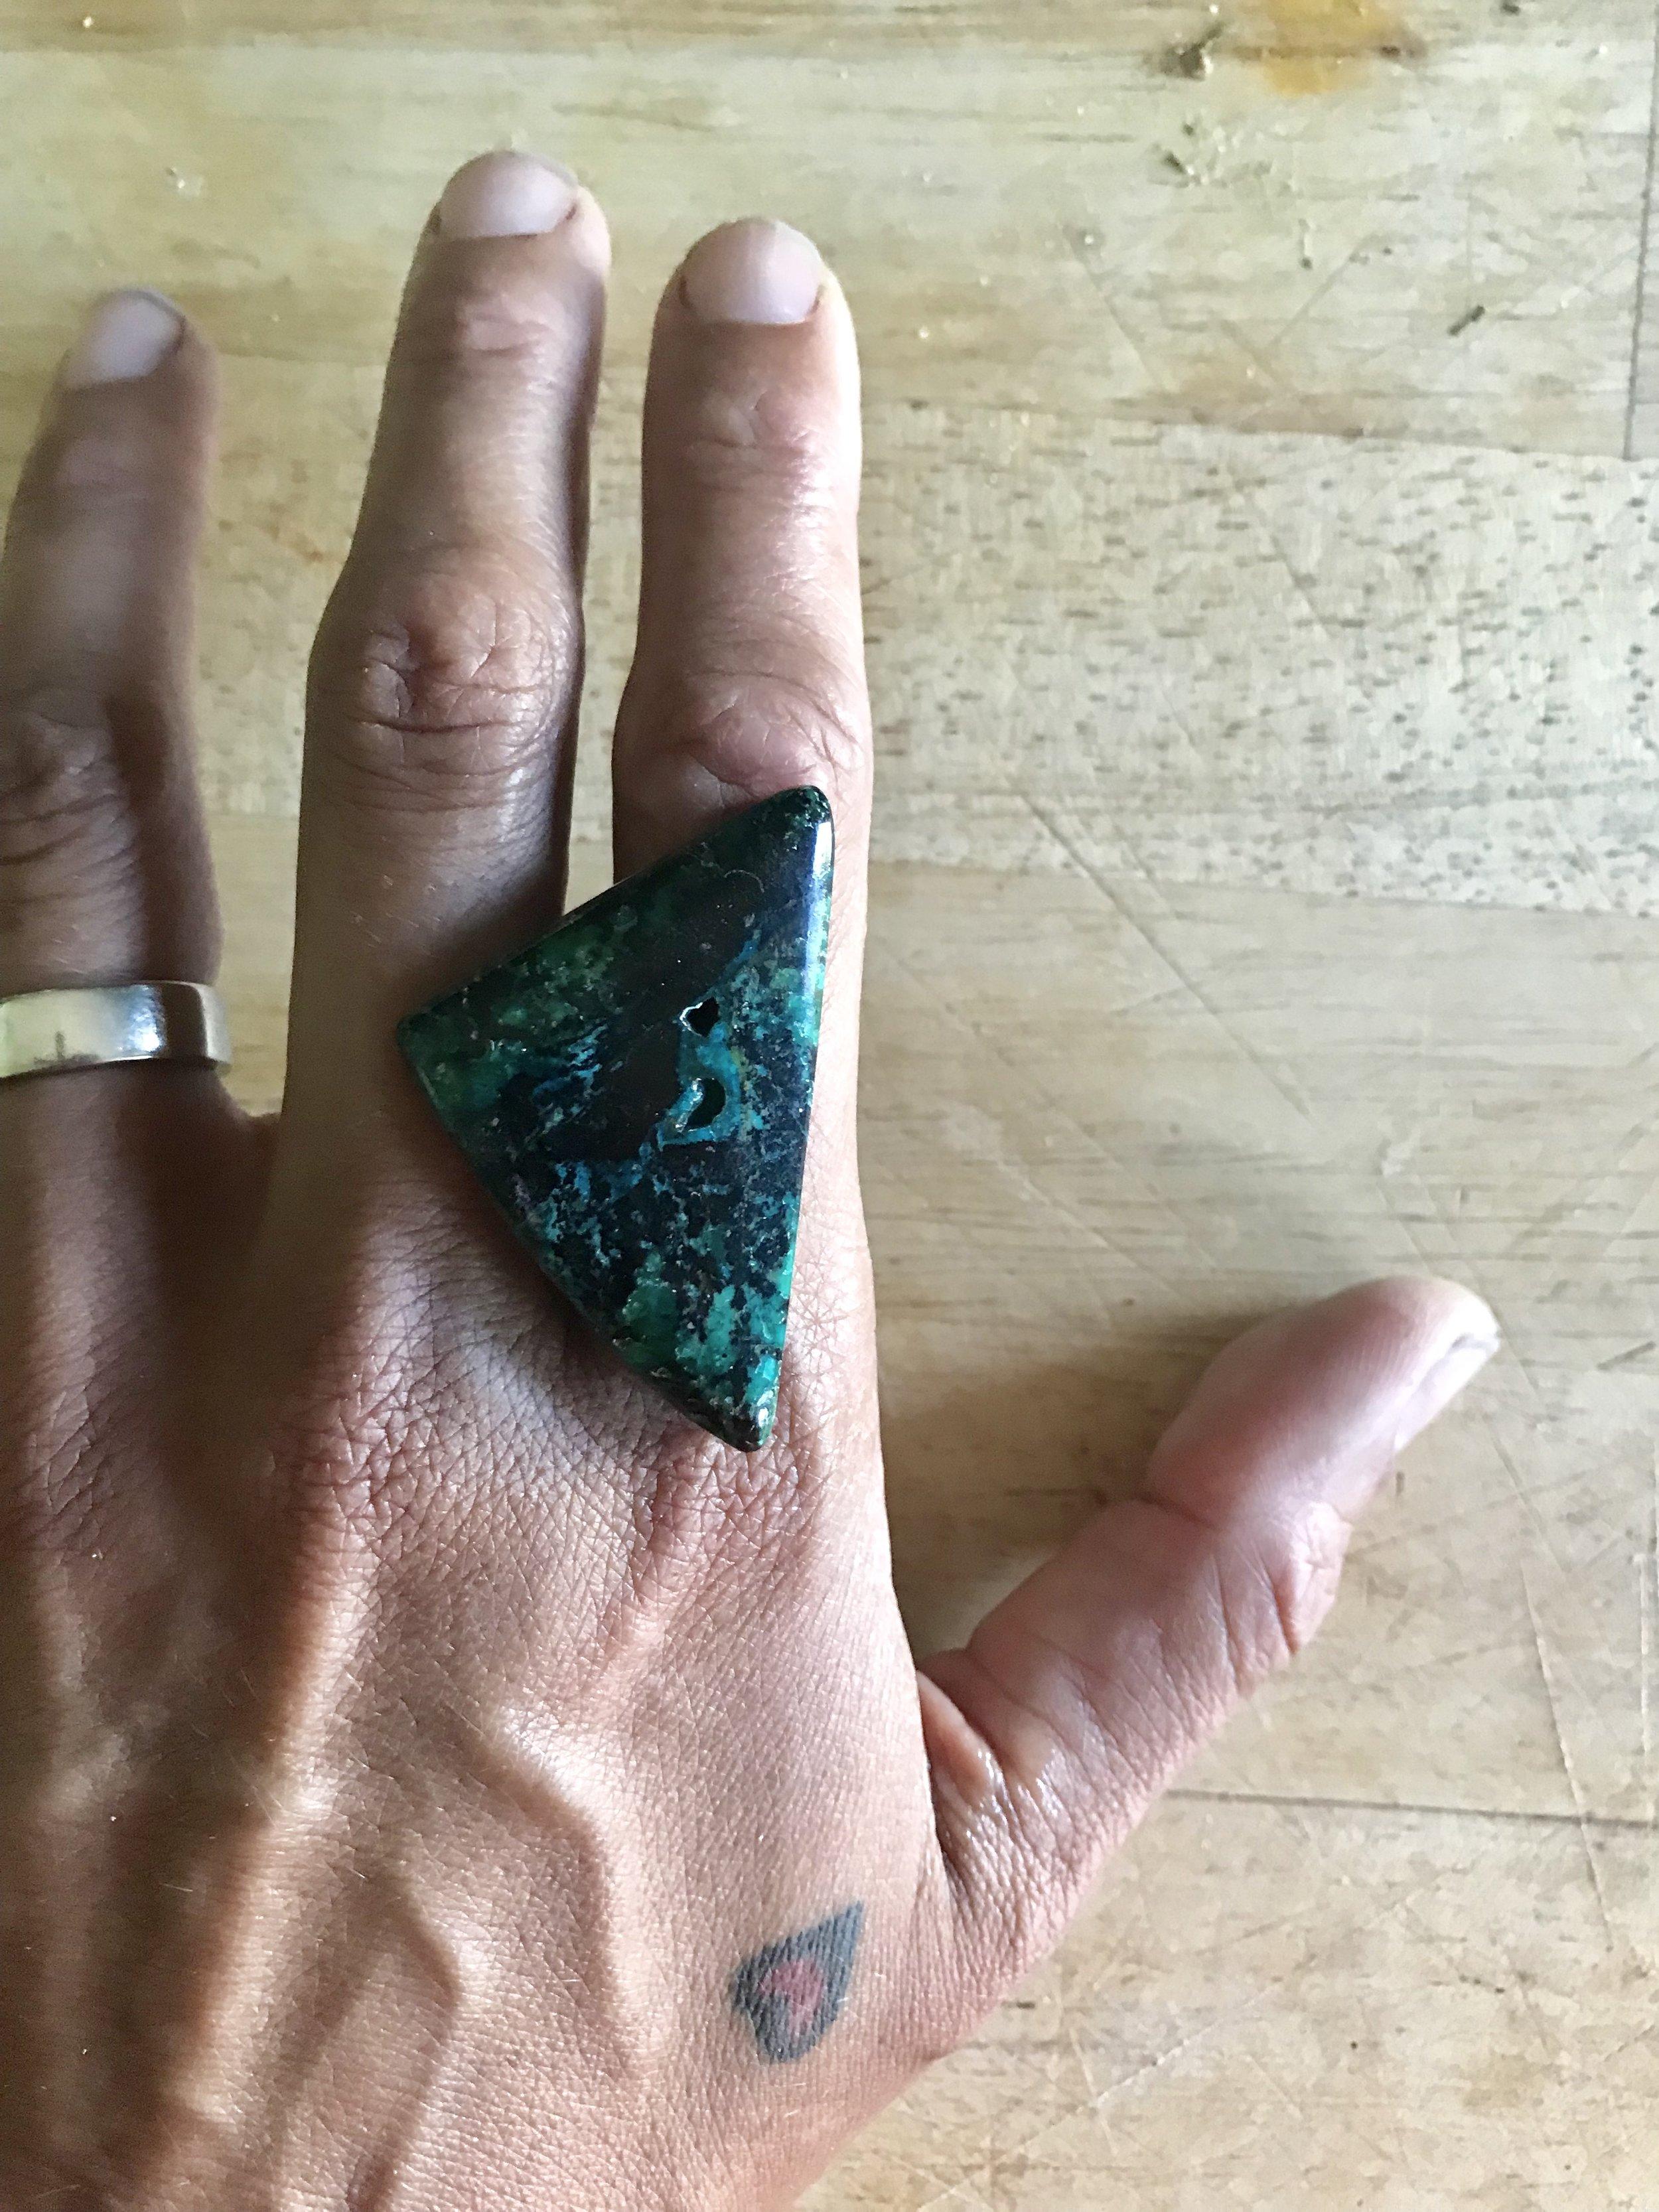 80s stone on hand